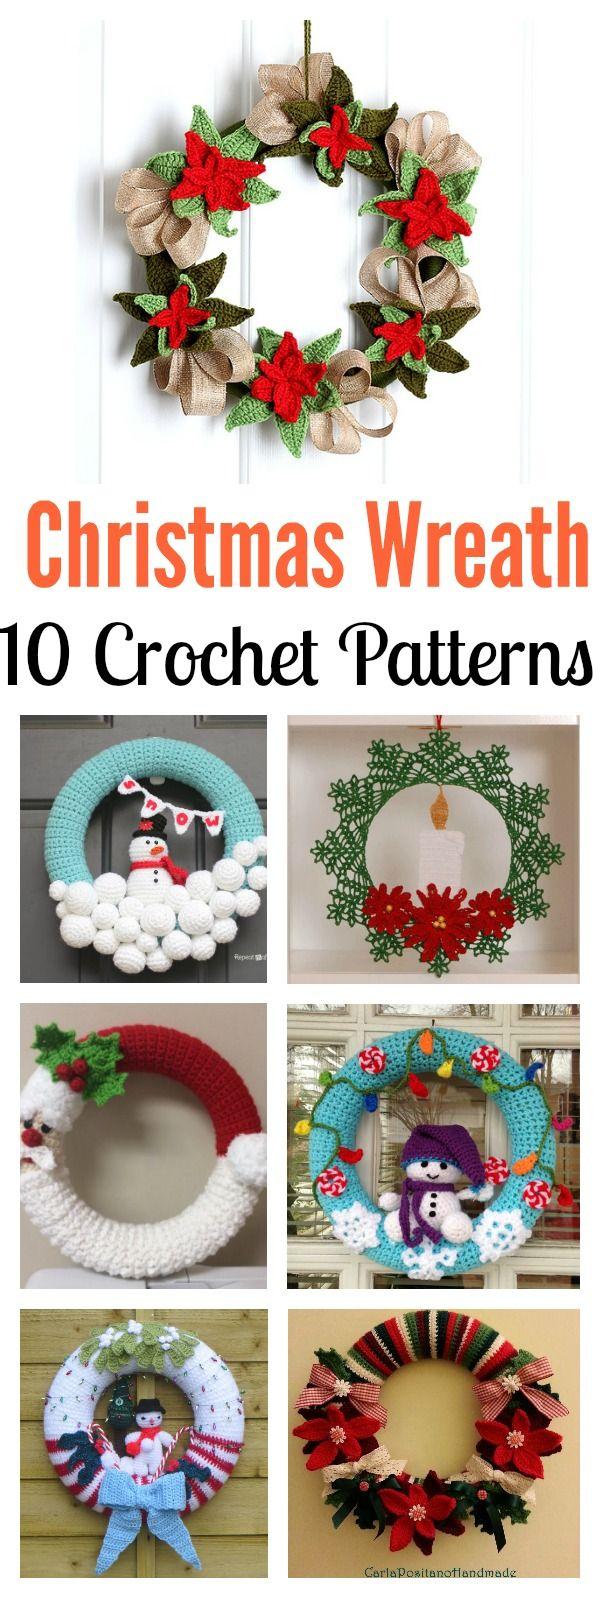 10 Christmas Wreath Crochet Patterns